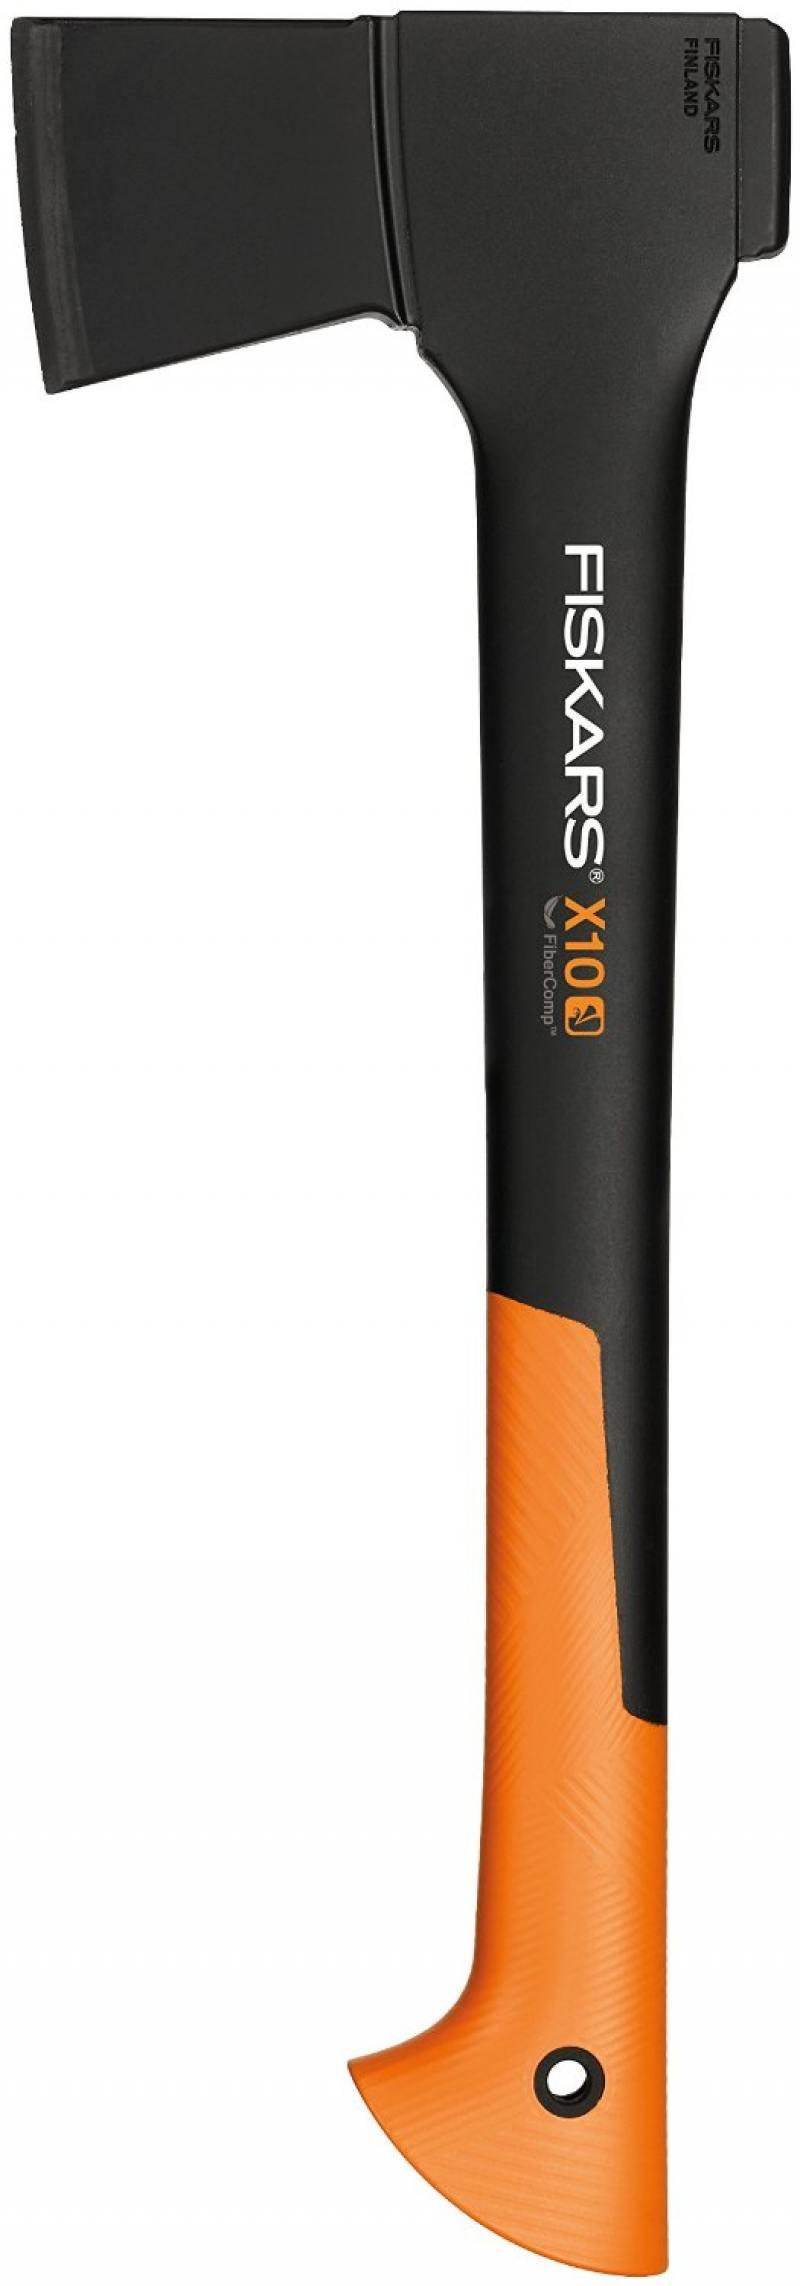 Топор Fiskars X10-S 121443